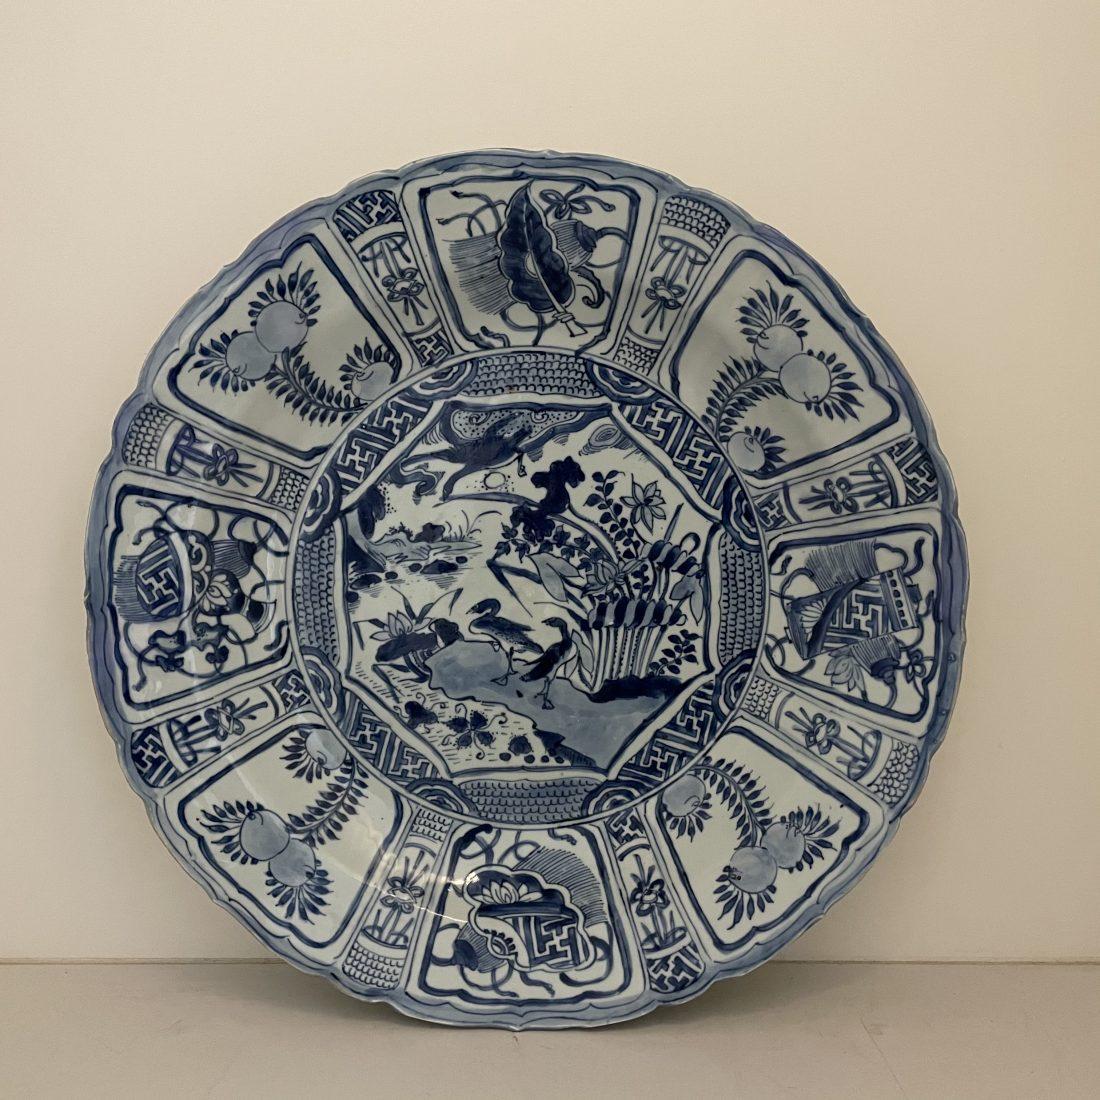 Wanli blauw/wit gegolfd porseleinen schotel, China, 17e eeuw